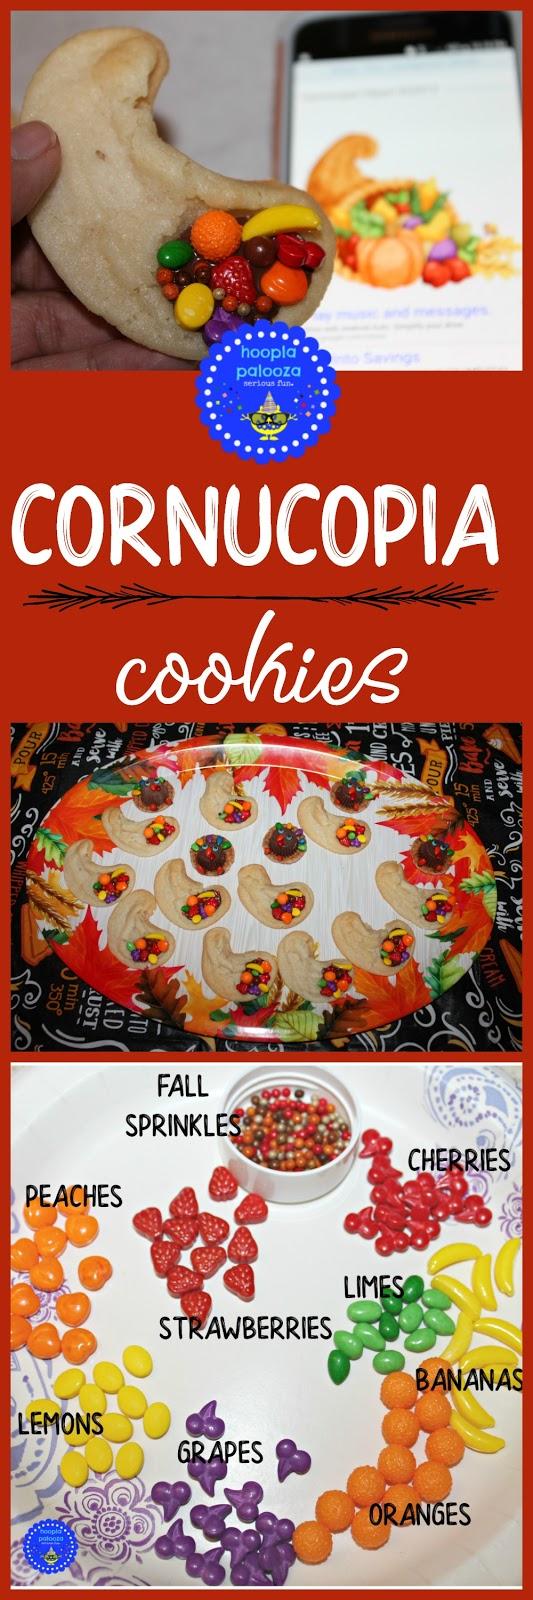 HOOPLA PALOOZA THANKSGIVING CORNUCOPIA COOKIES